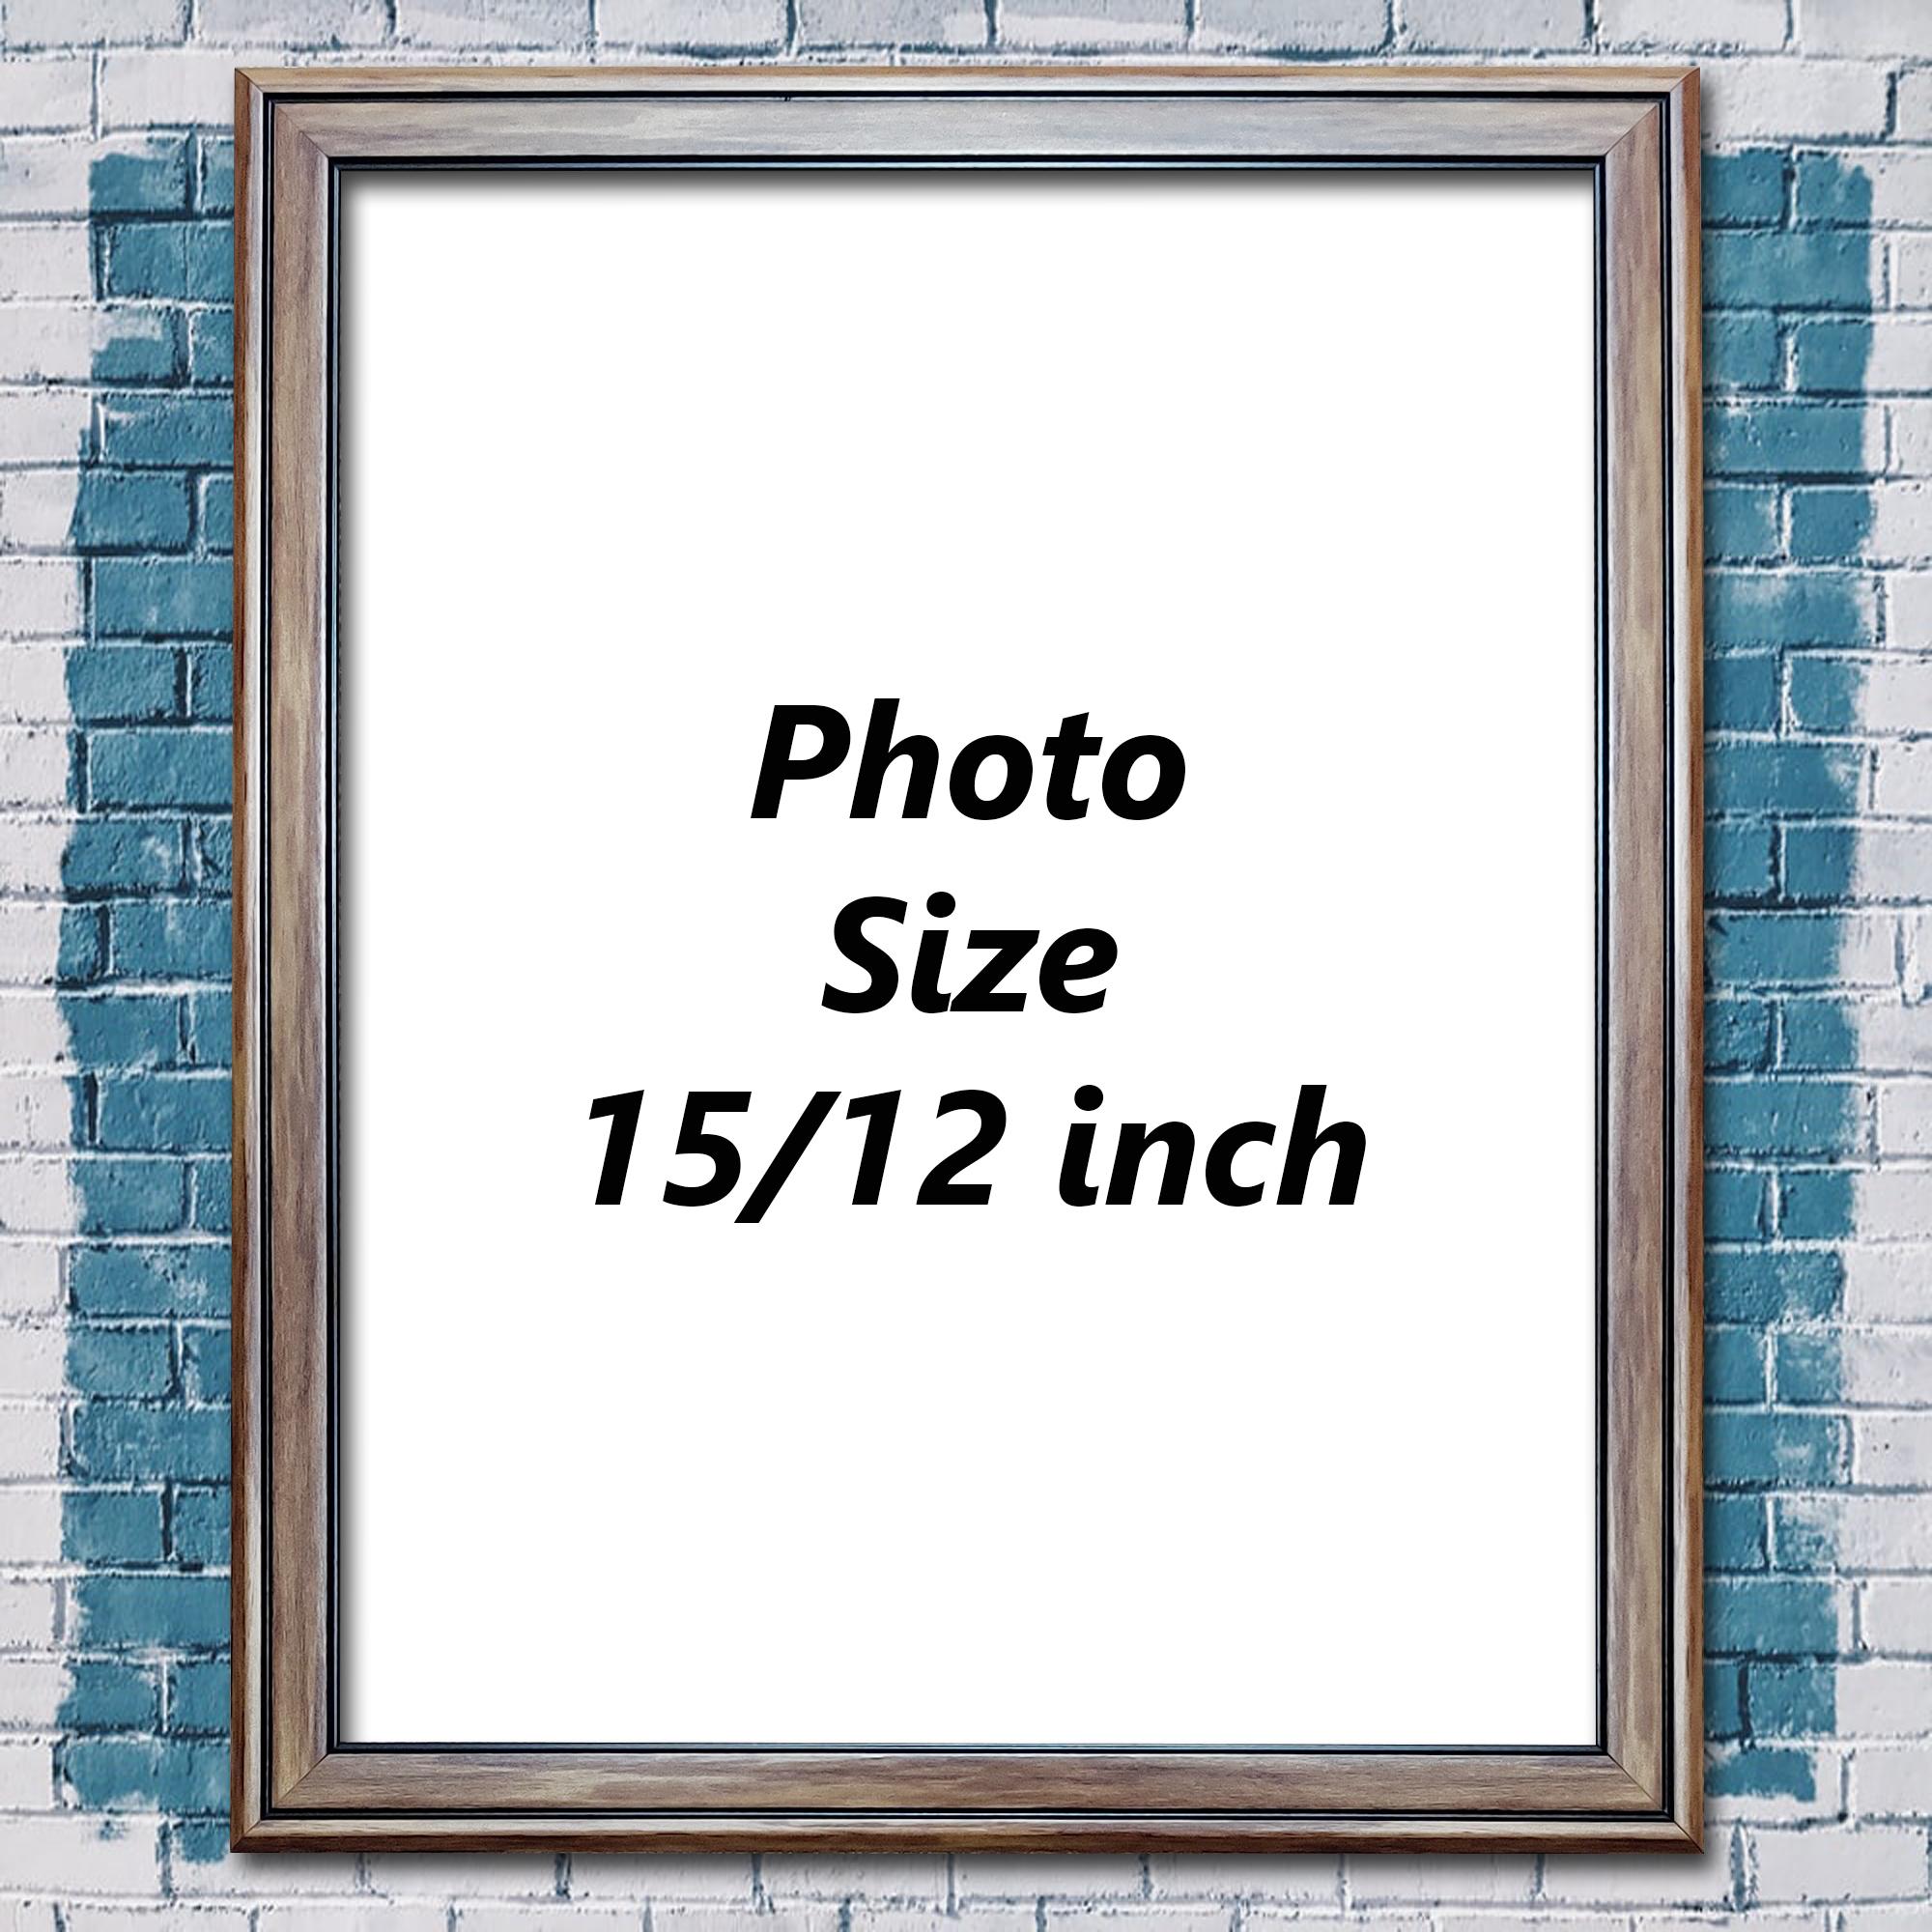 Photo Frame 15/12 Inch BN11 (Glossy Lamination)